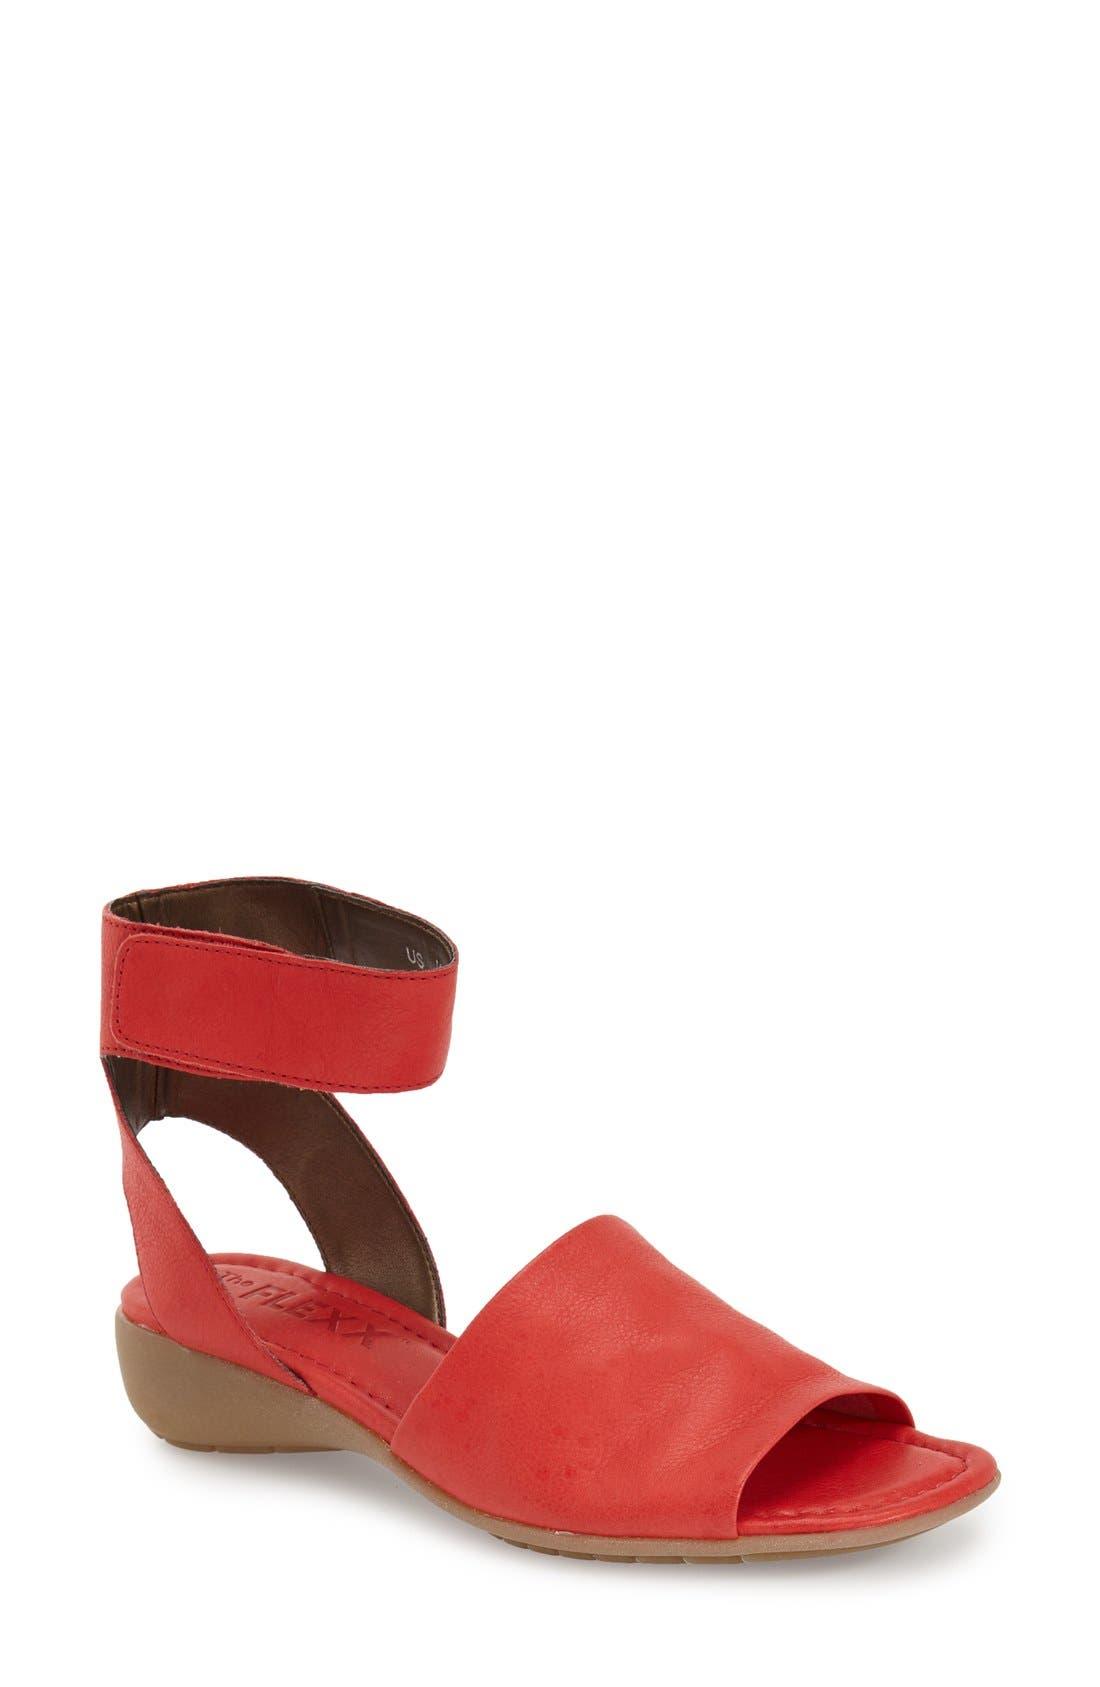 'Beglad' Leather Ankle Strap Sandal,                             Main thumbnail 16, color,